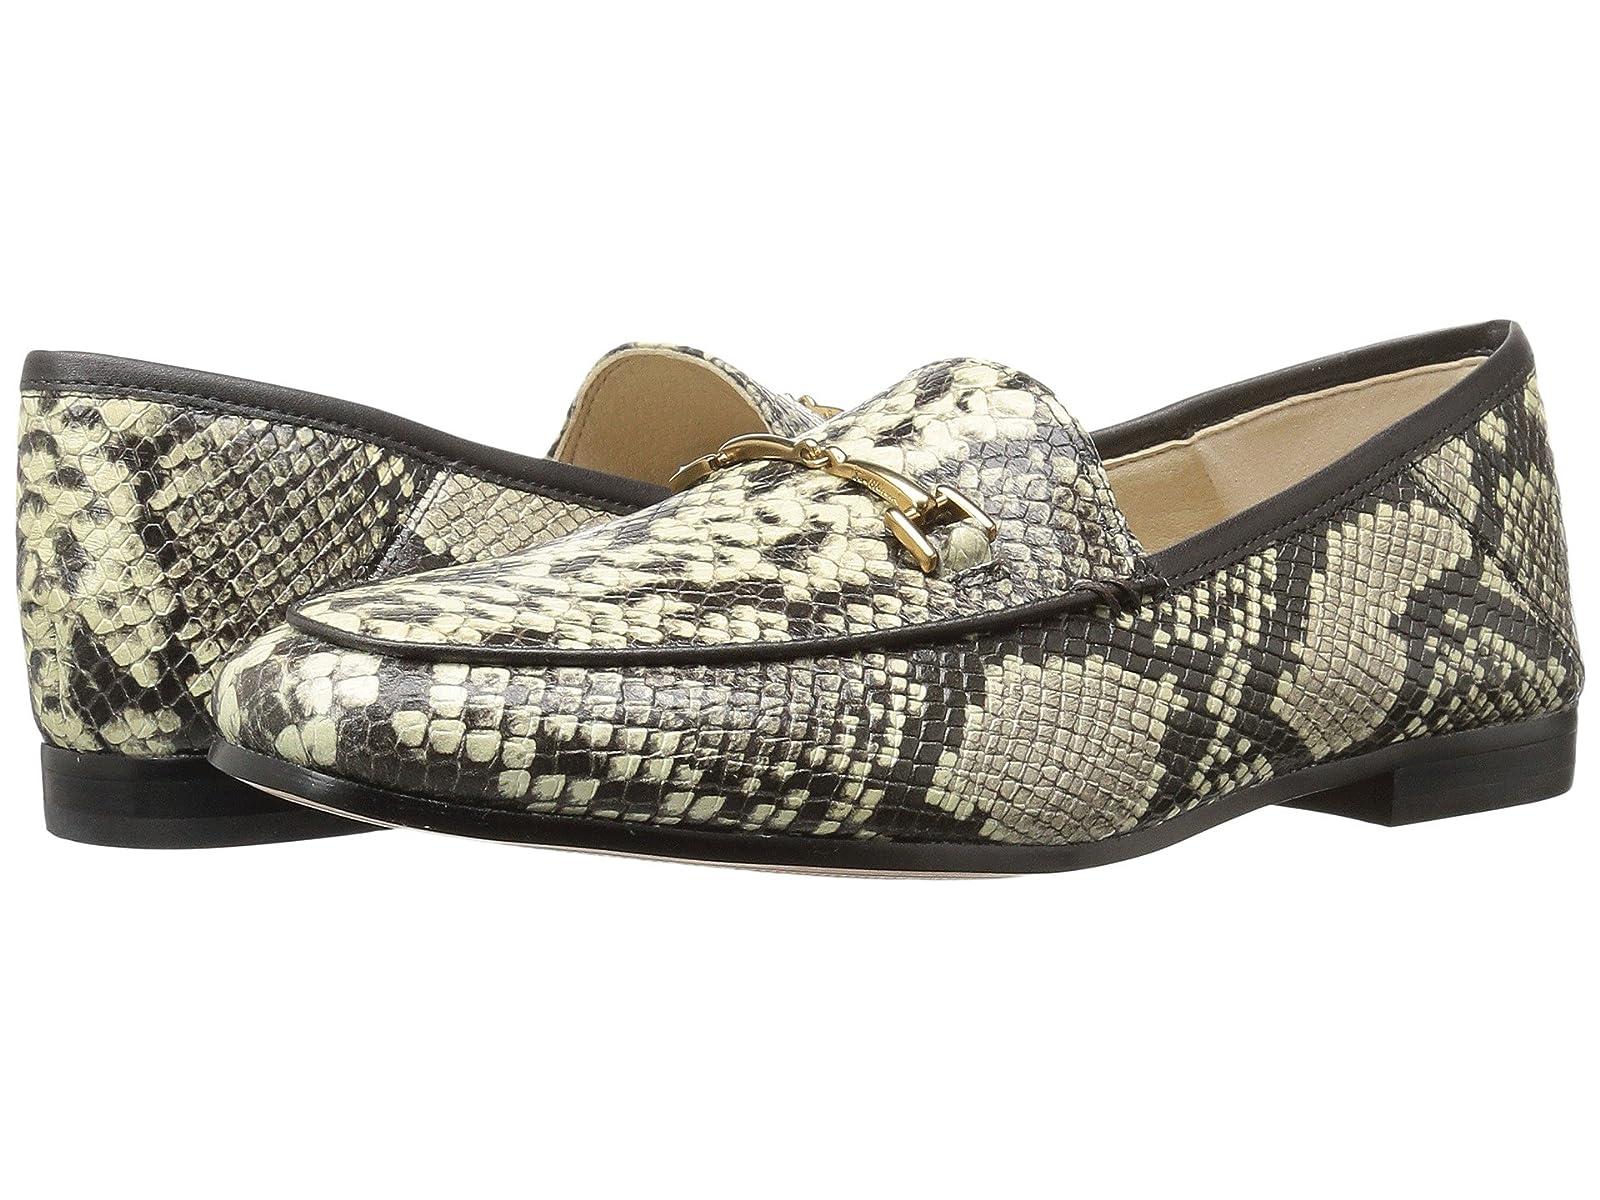 Sam Edelman LoraineCheap and distinctive eye-catching shoes